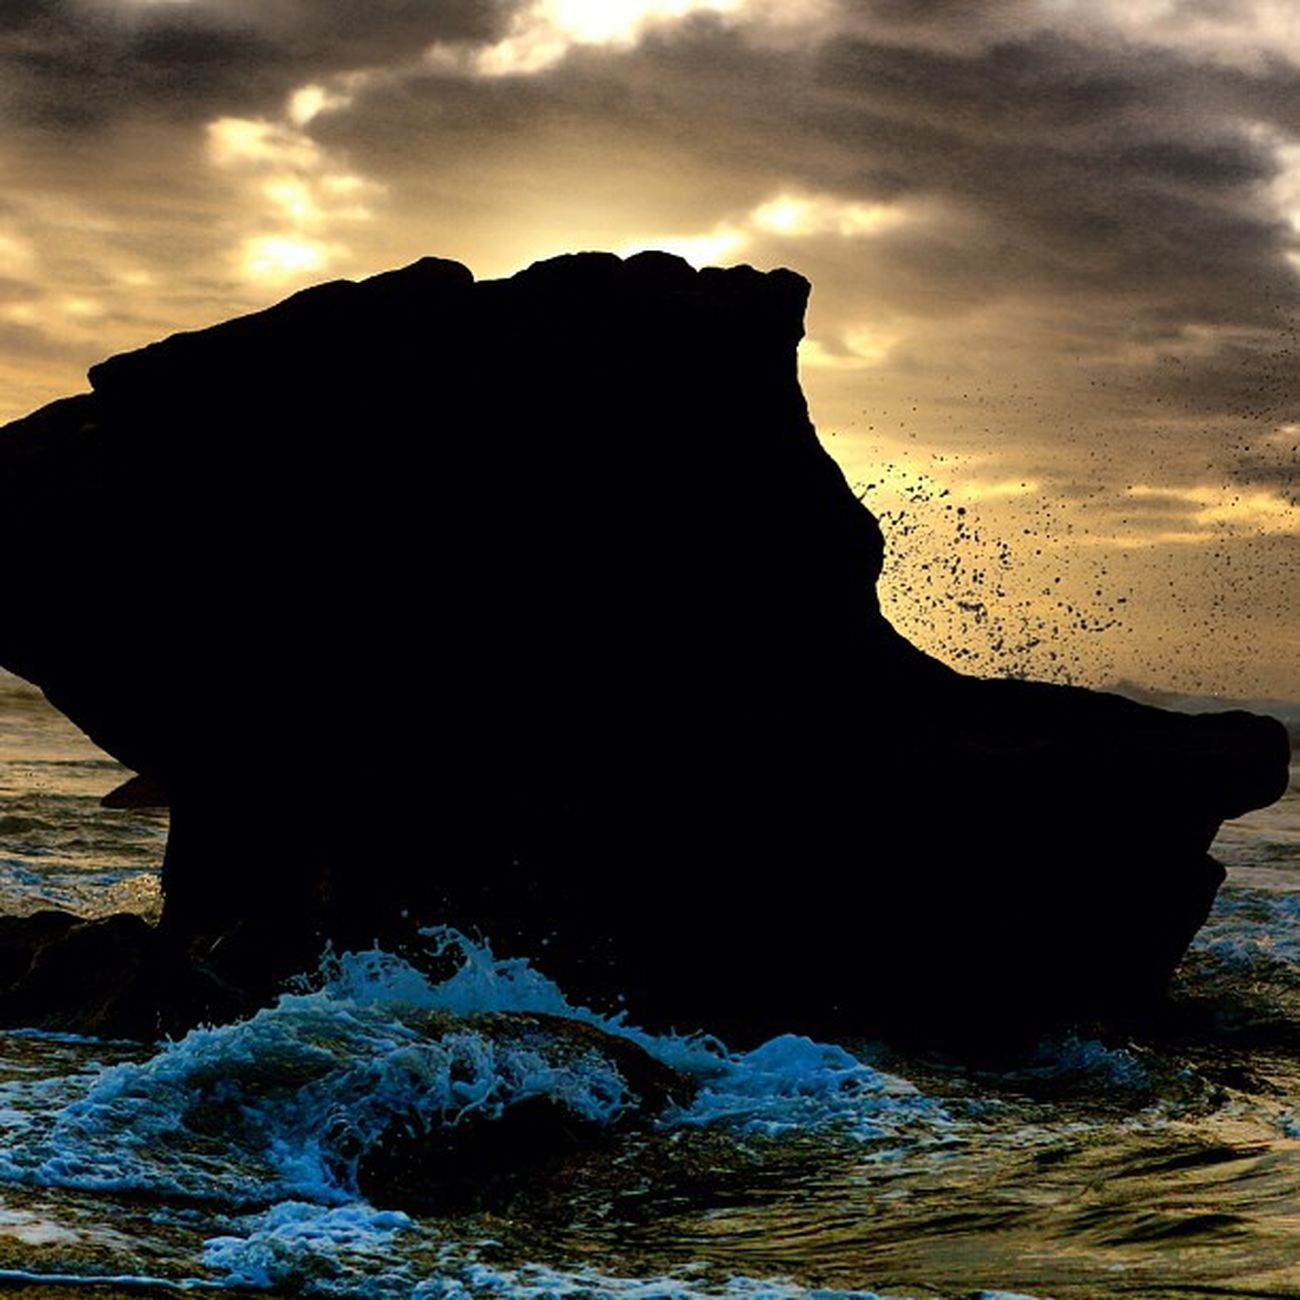 #figueira #figueiradafoz #igers #igersfigueira #igers_figueira #portugaligers #portugaloteuolhar #portugal_em_fotos #portugaldenorteasul #p3top #iphone5 #iphonesia #iphoneonly #iphonegraphy #iphonephotography #instagood #instagram #instalove #instamood #i Instagood Instalove Beach Iphonegraphy Sun Figueira Sunset Igersfigueira Figueiradafoz Canon Portugaligers Iphoneonly Portugaldenorteasul Iphonesia Buarcos Instagram Iphonephotography Portugaloteuolhar IPhone5 Eos650 Instamood Igers_figueira P3top Portugal_em_fotos Igers Instagramers Ig_portugal